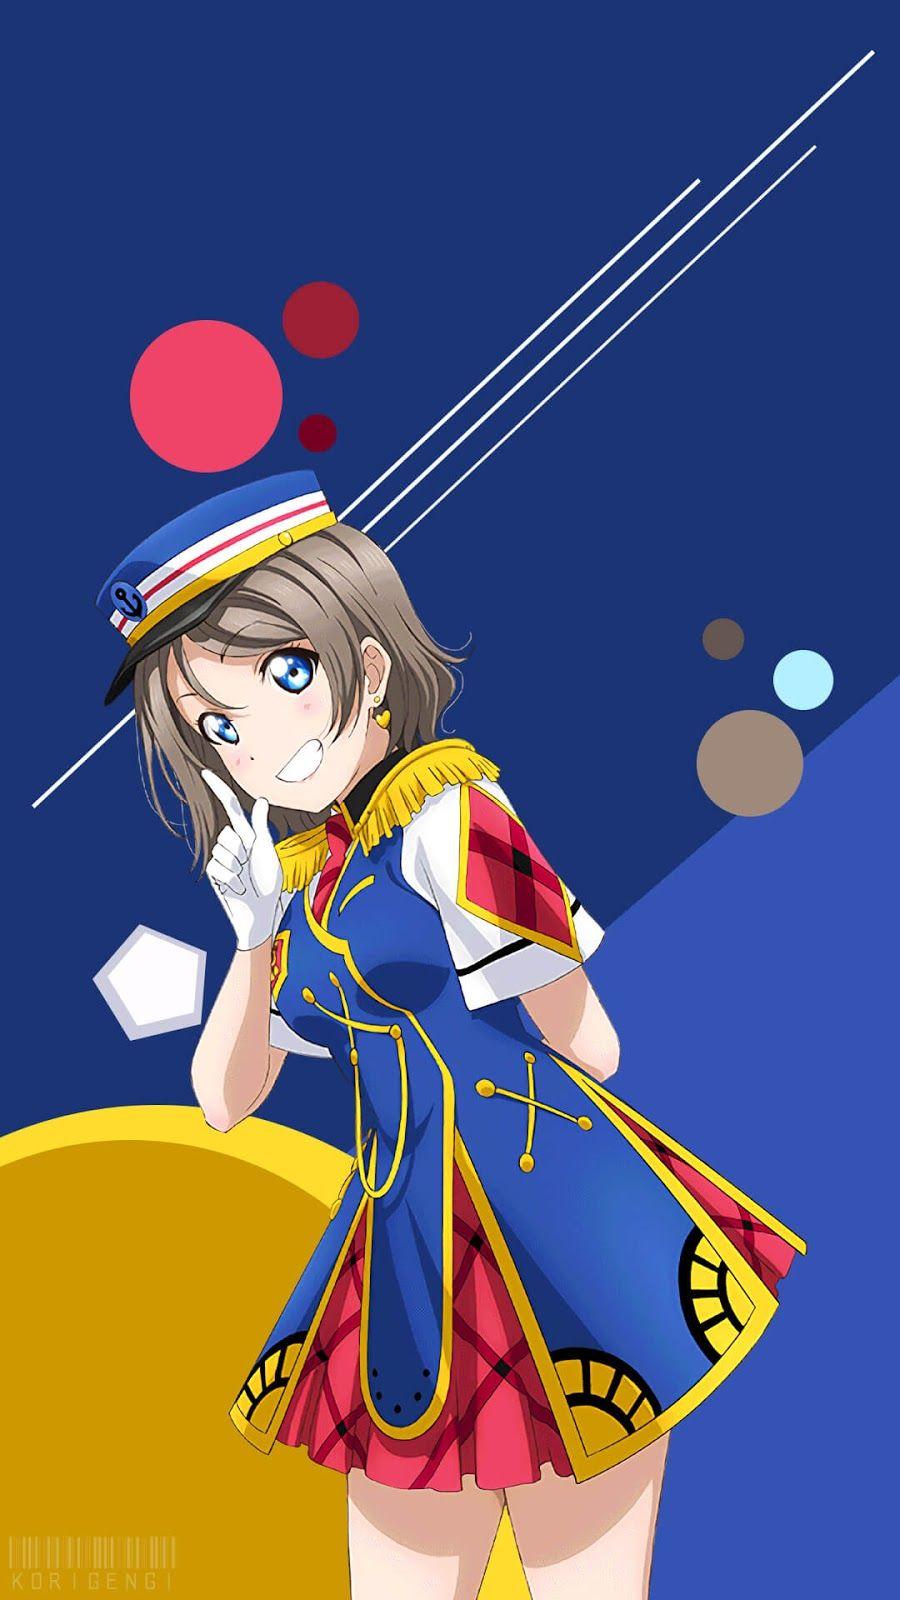 Watanabe You Love Live Wallpaper Gadis Anime Animasi Gambar